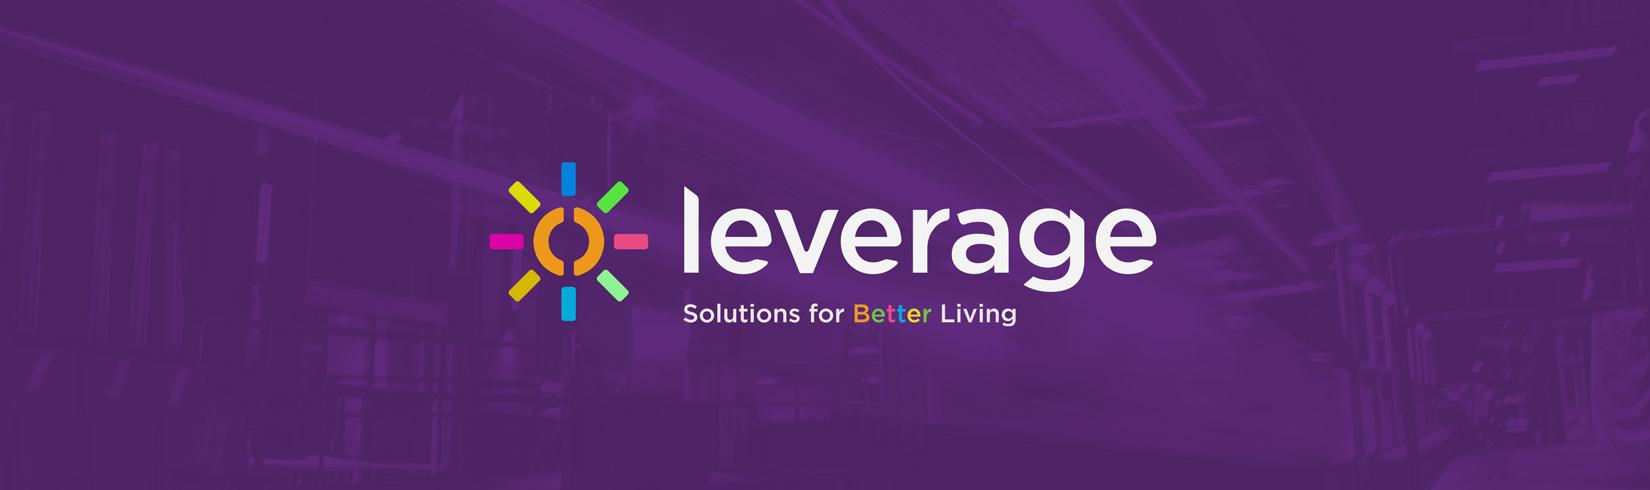 Leverage-0